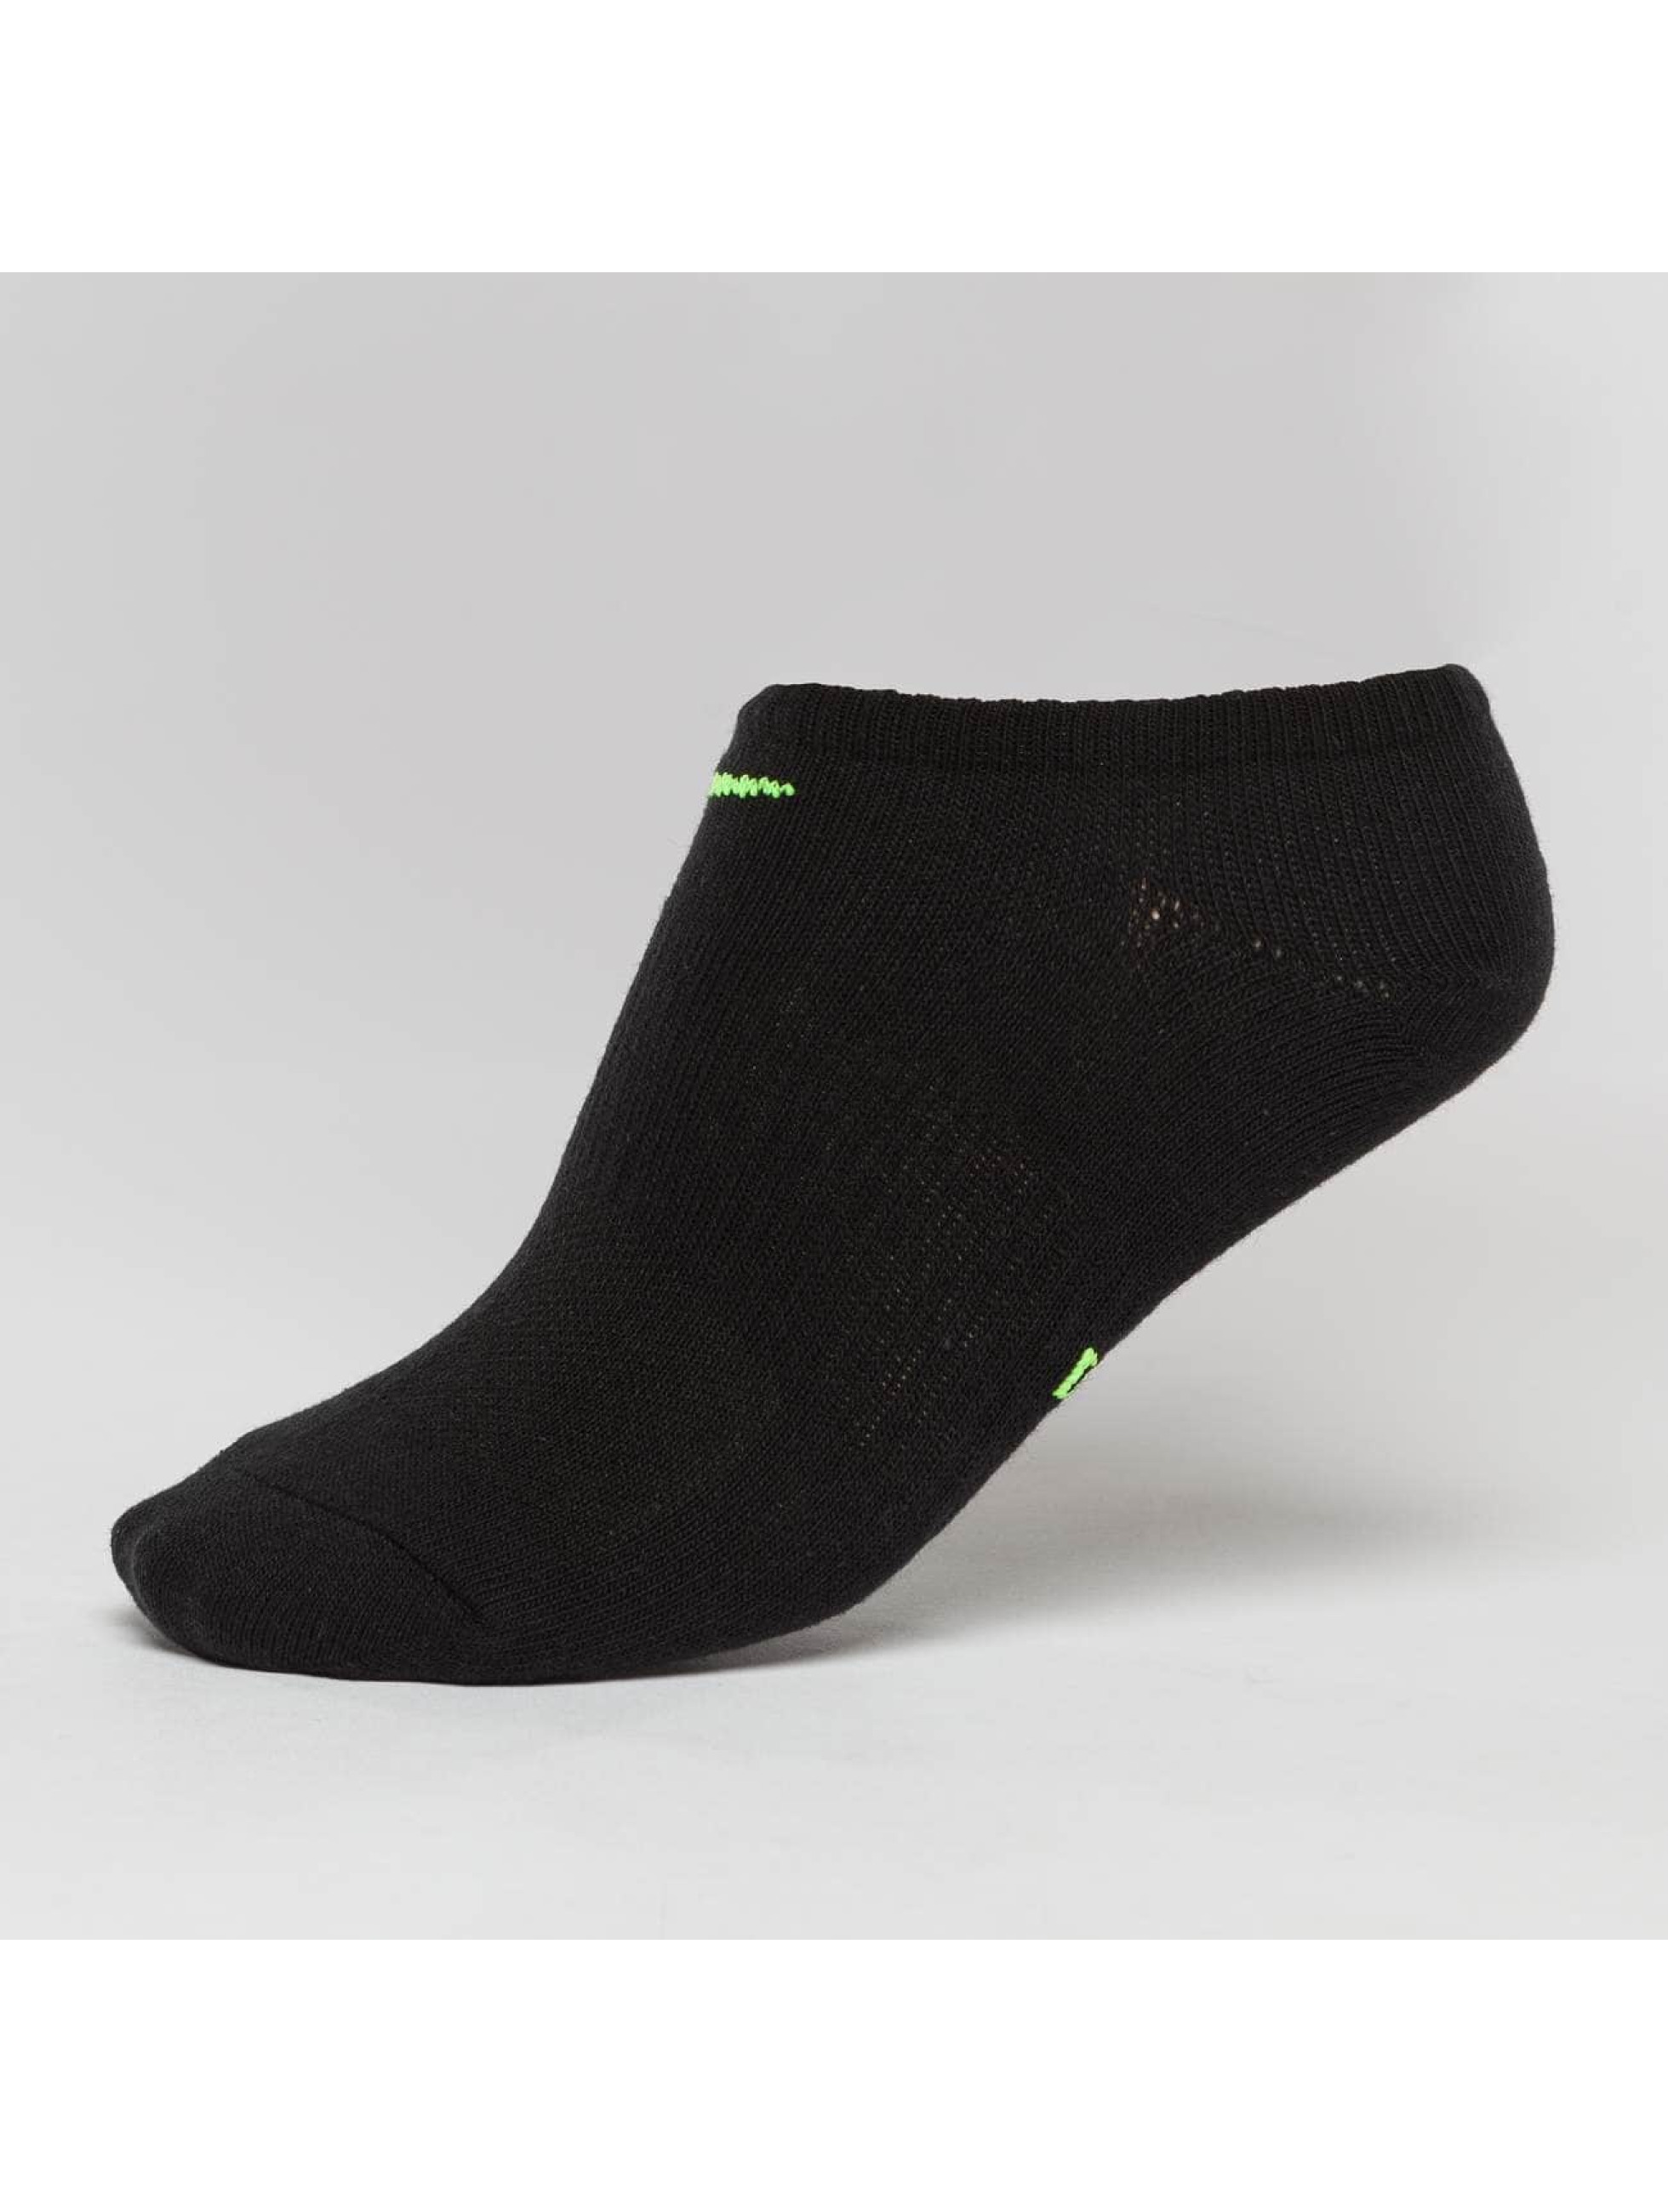 Nike Performance Socks Everyday Lightweight No-Show Training 3 Pack black